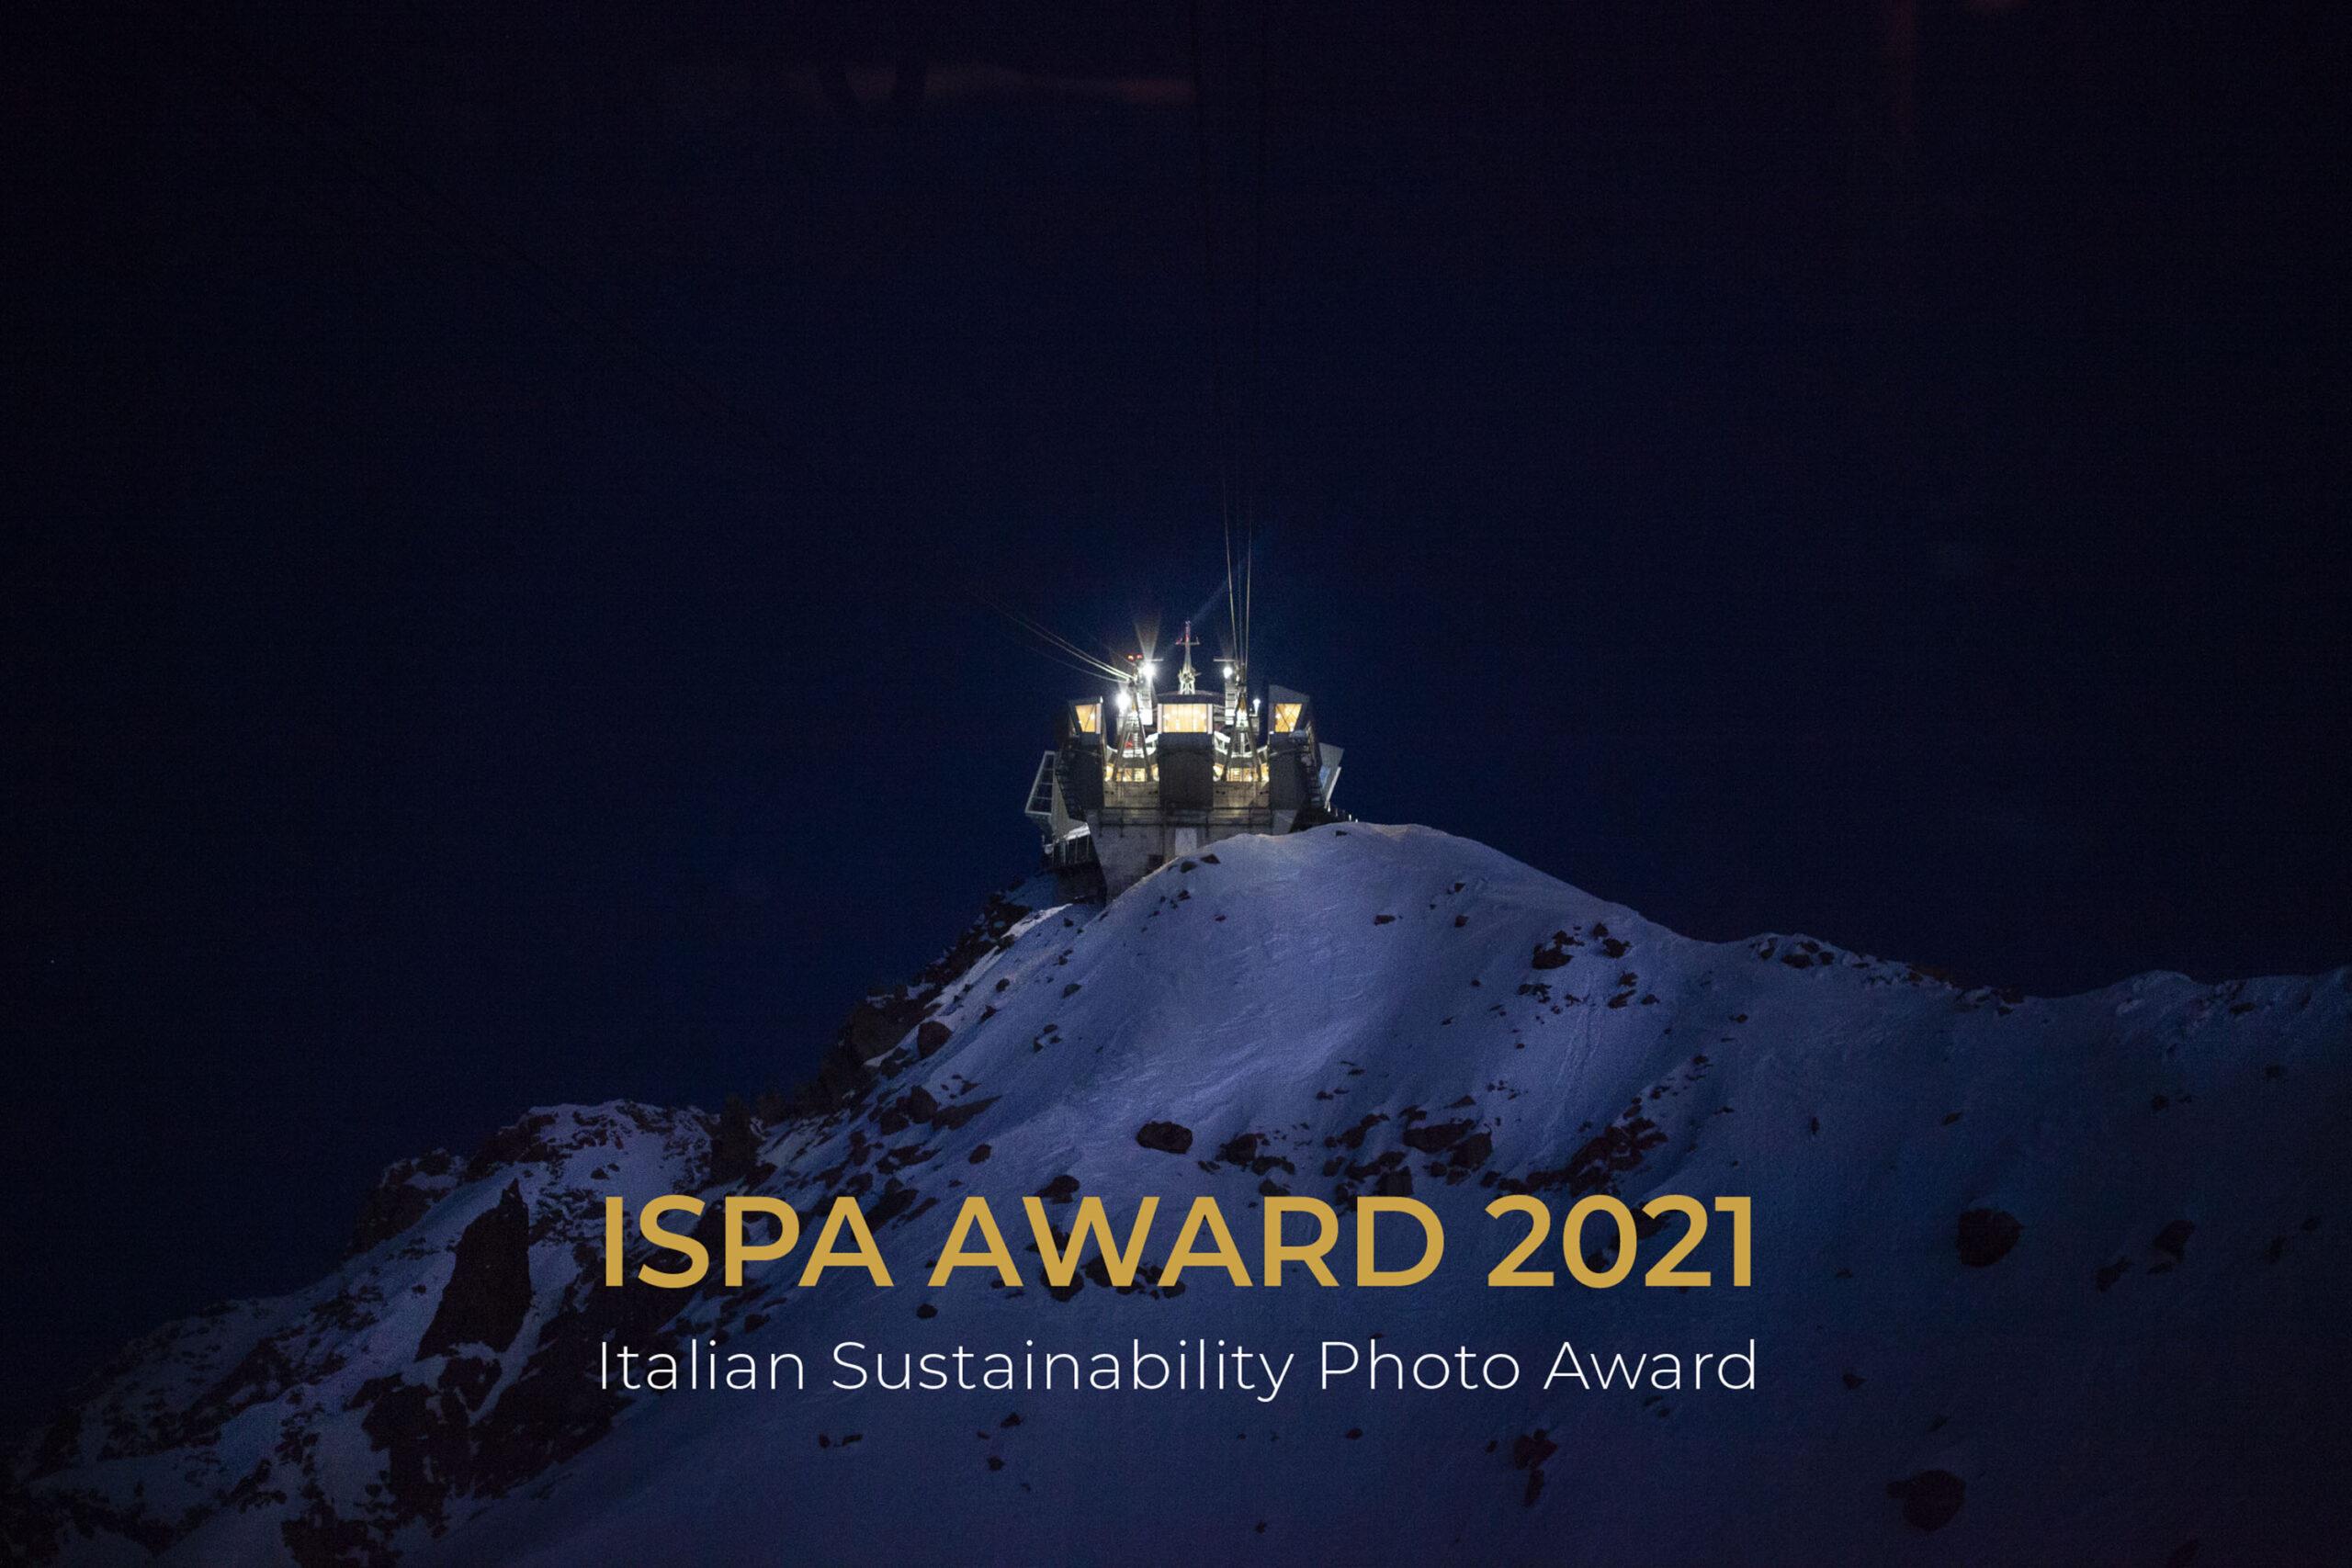 ISPA 2021